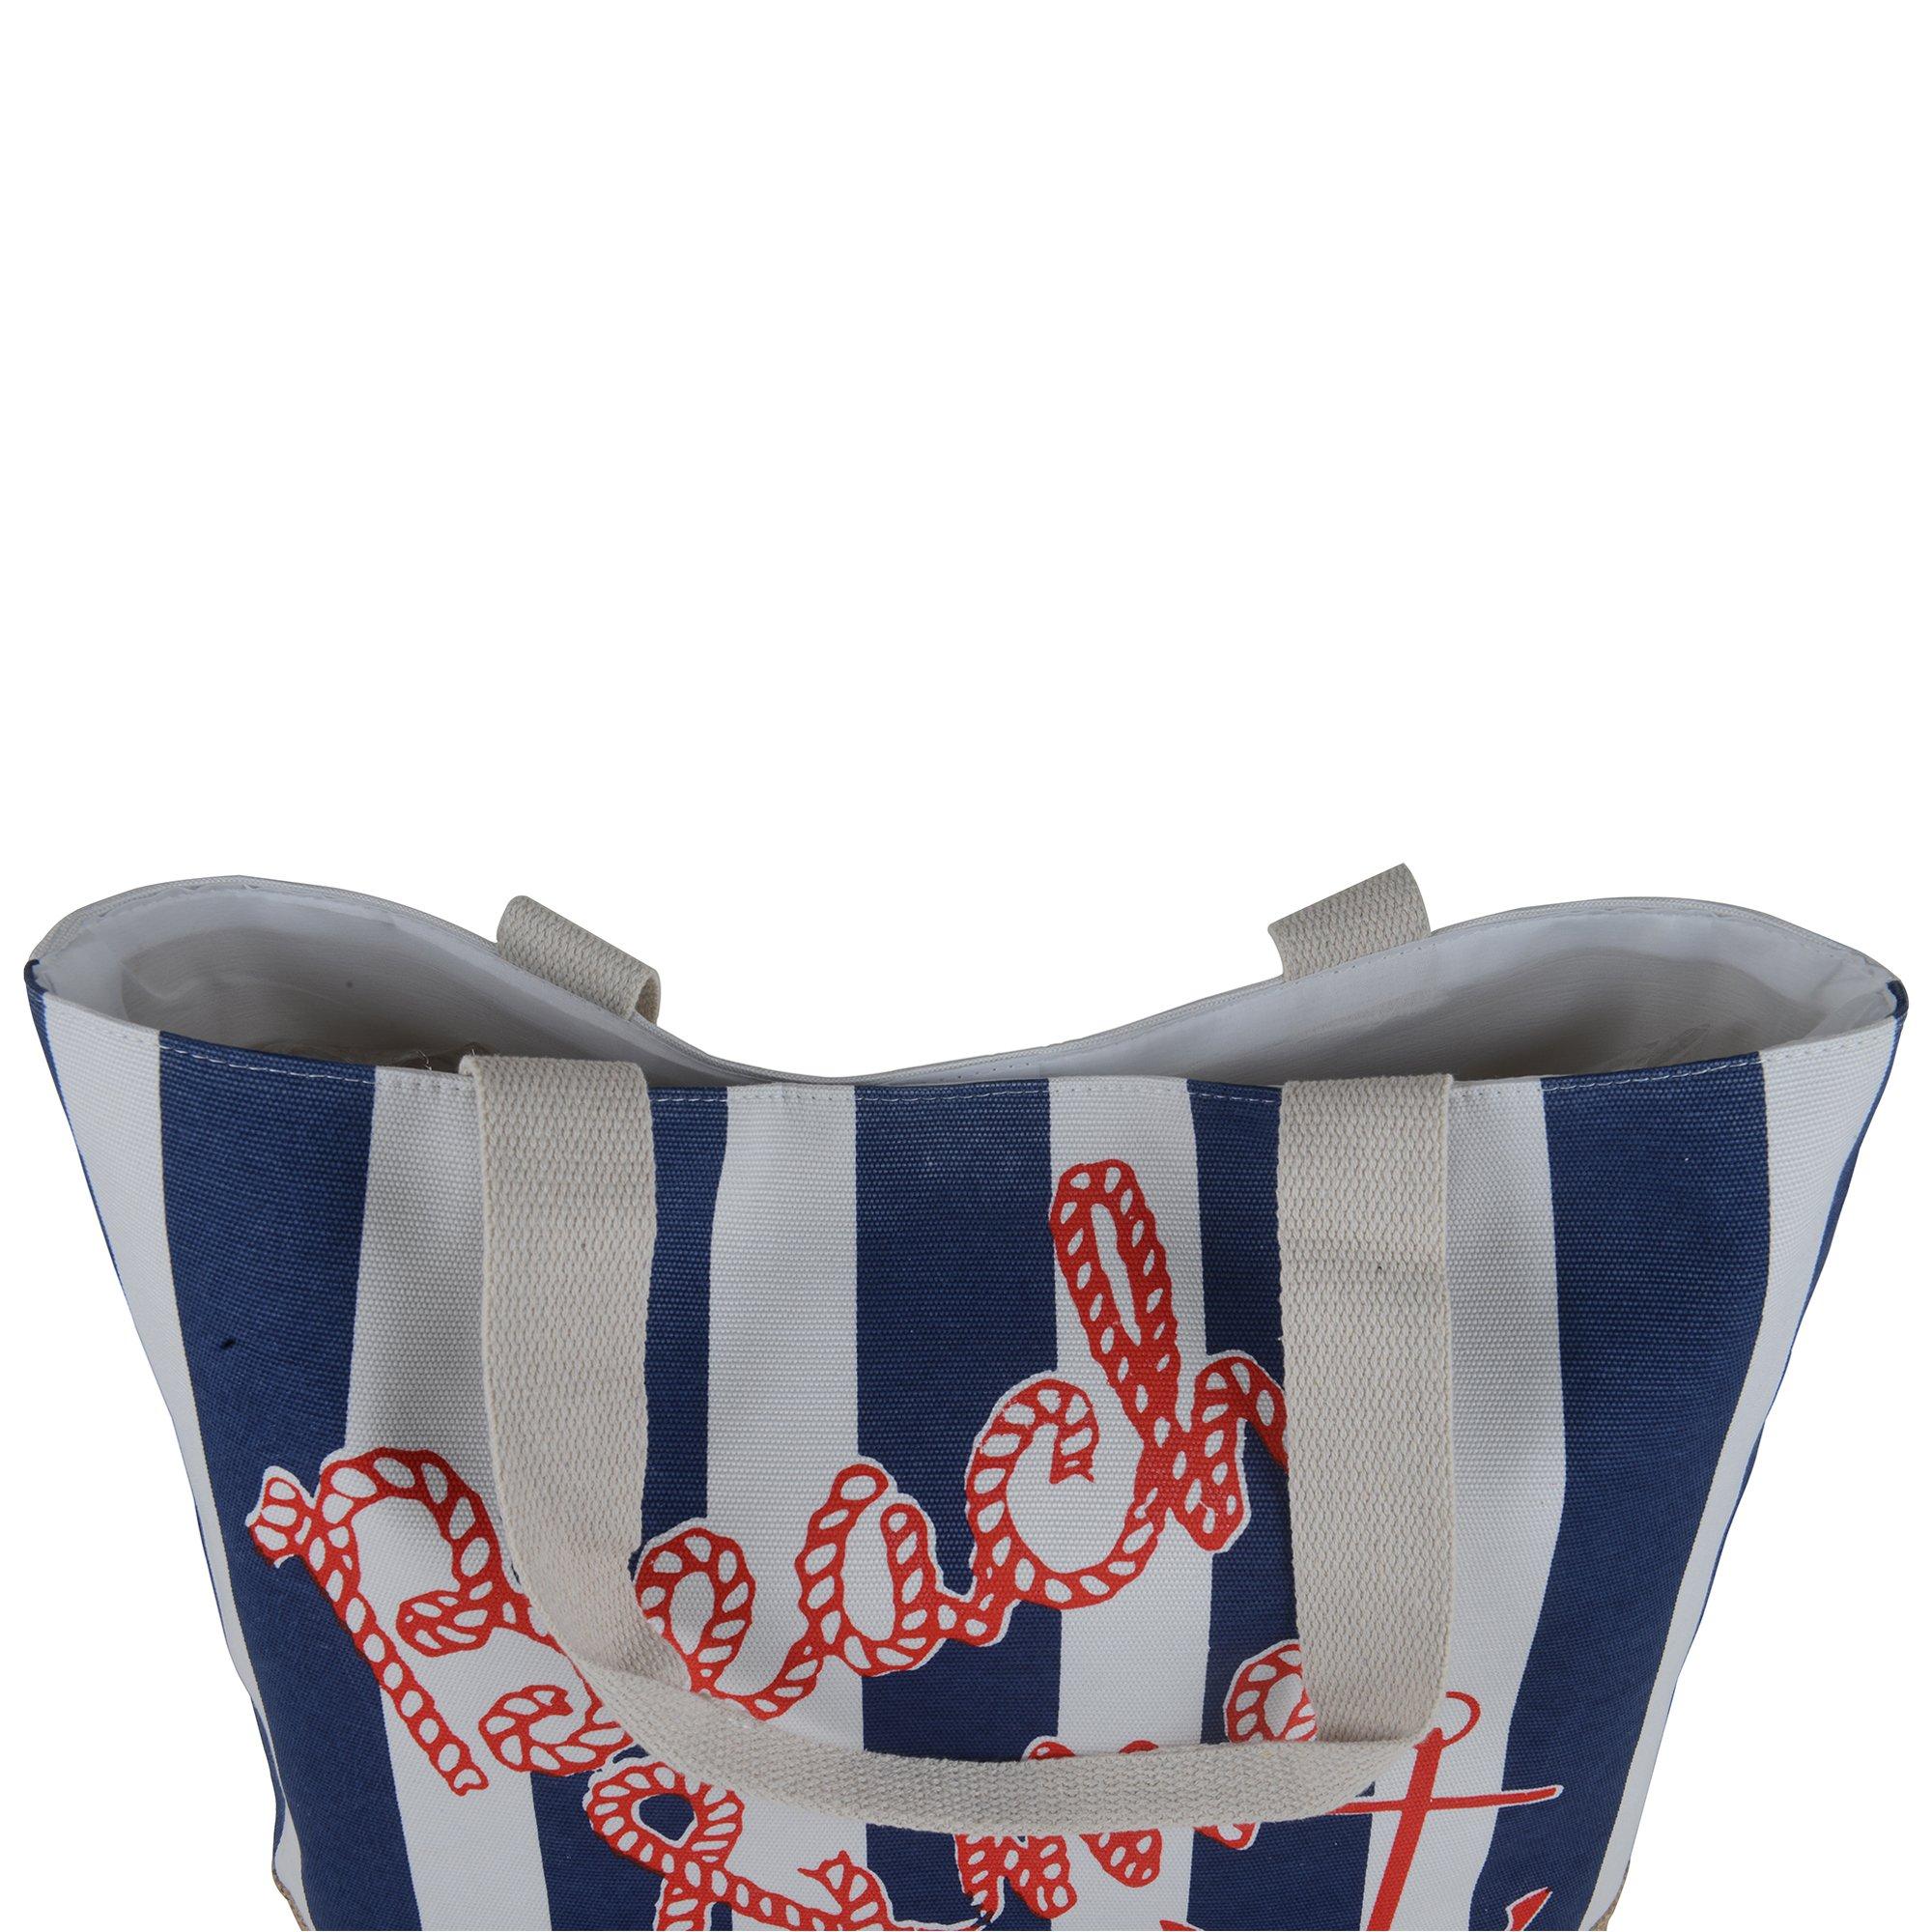 Canvas Burlap Beach & Me Printed Cotton Heavy Shoulder Straps Premium Women Tote Bag by BB (Navy Blue) by BB (Image #3)